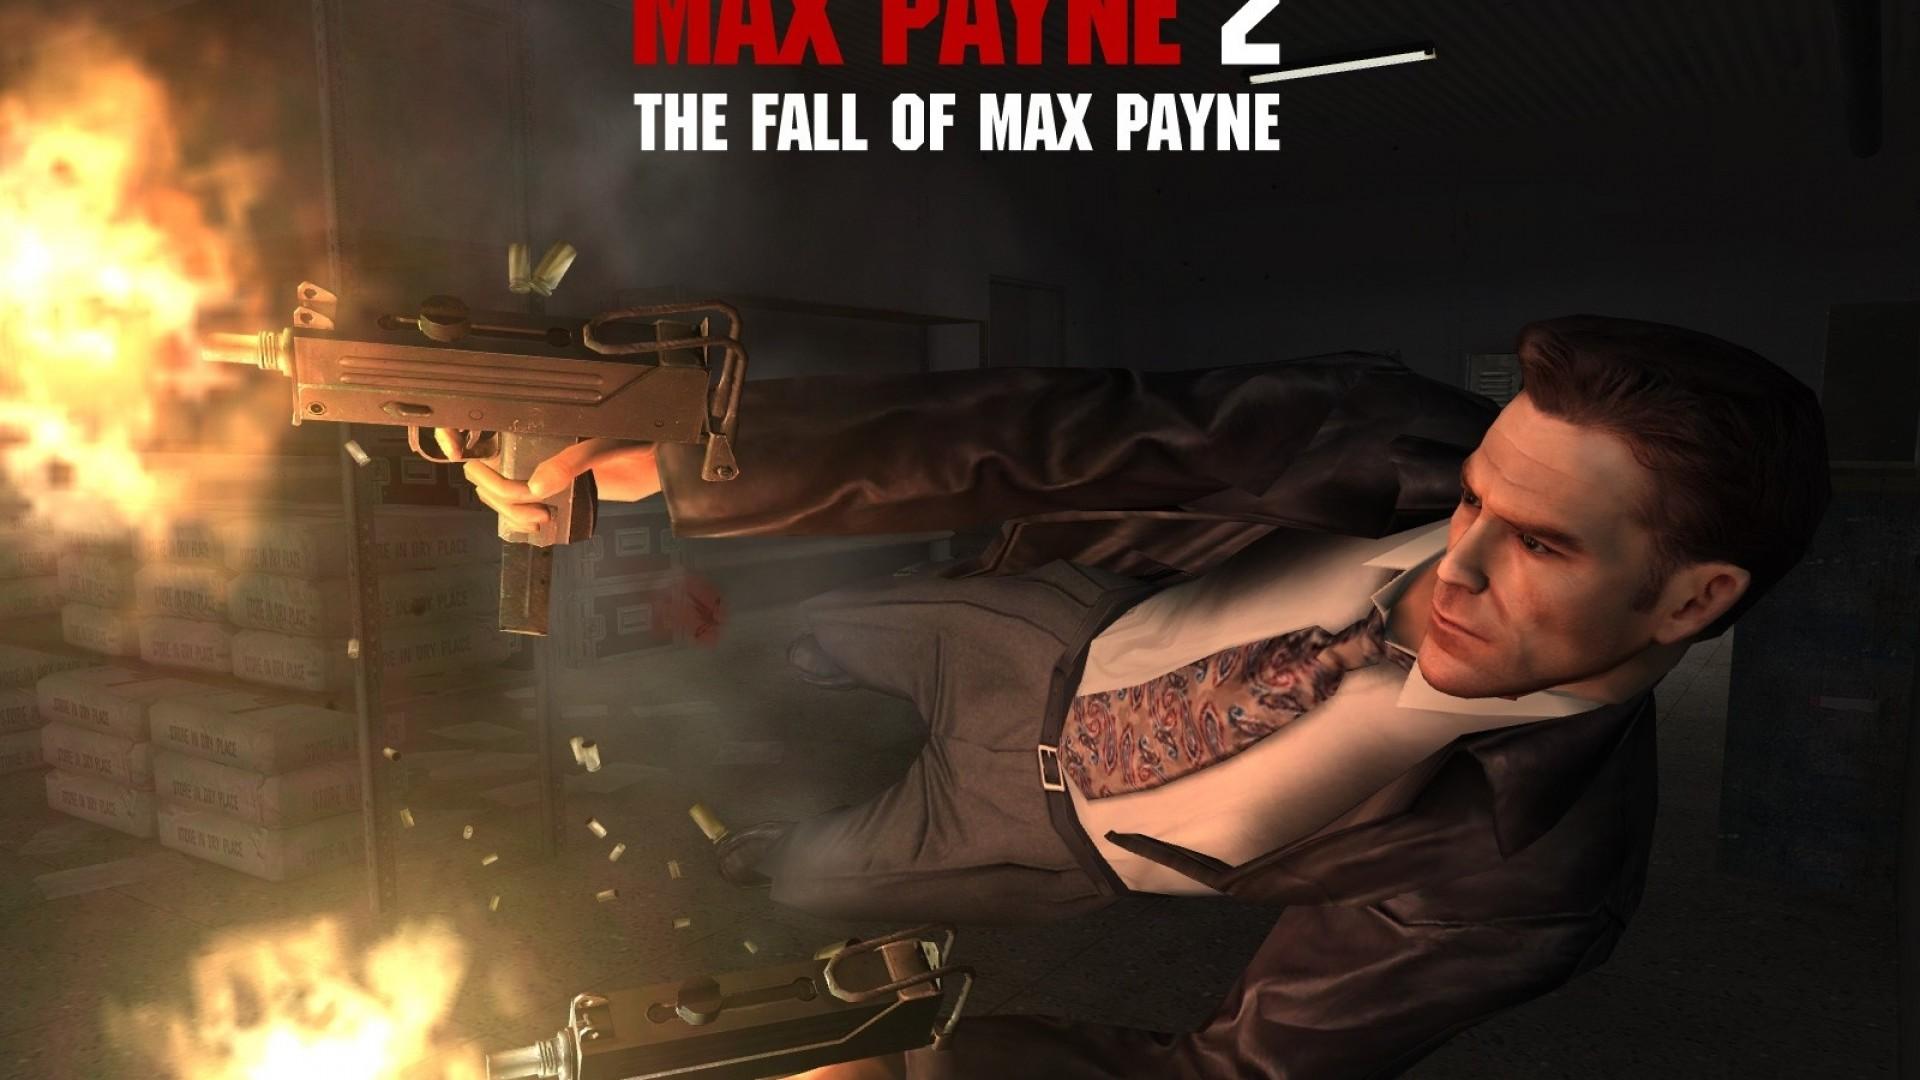 Max Payne Wallpaper 65 Images